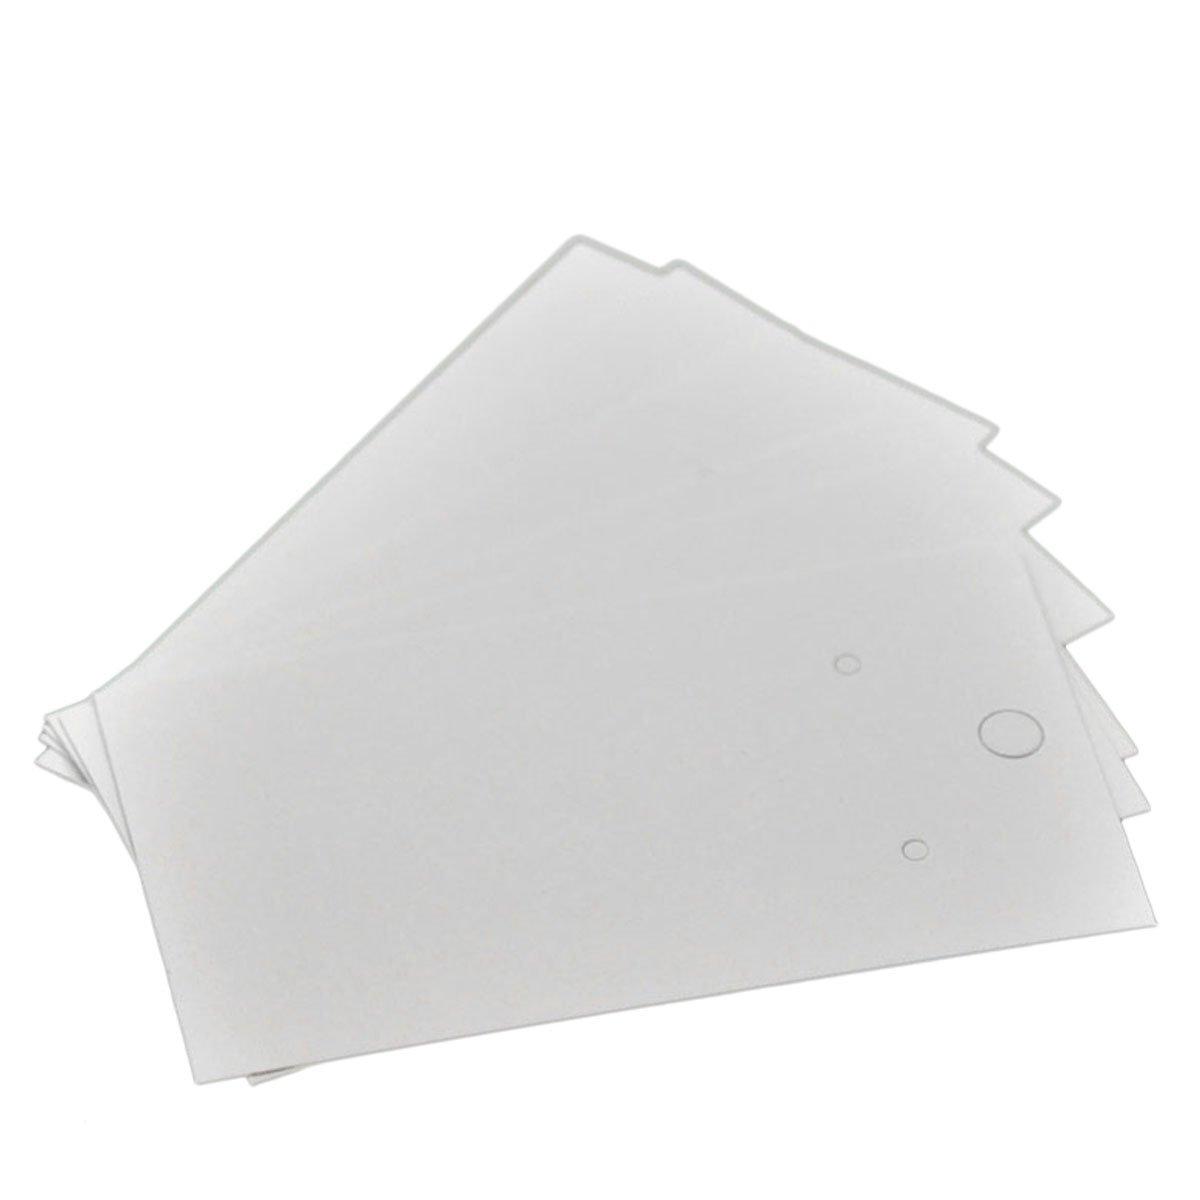 HOUSWEETY 100PCs White Earrings Jewelery Display Cards 9x5cm 3 4//8x2